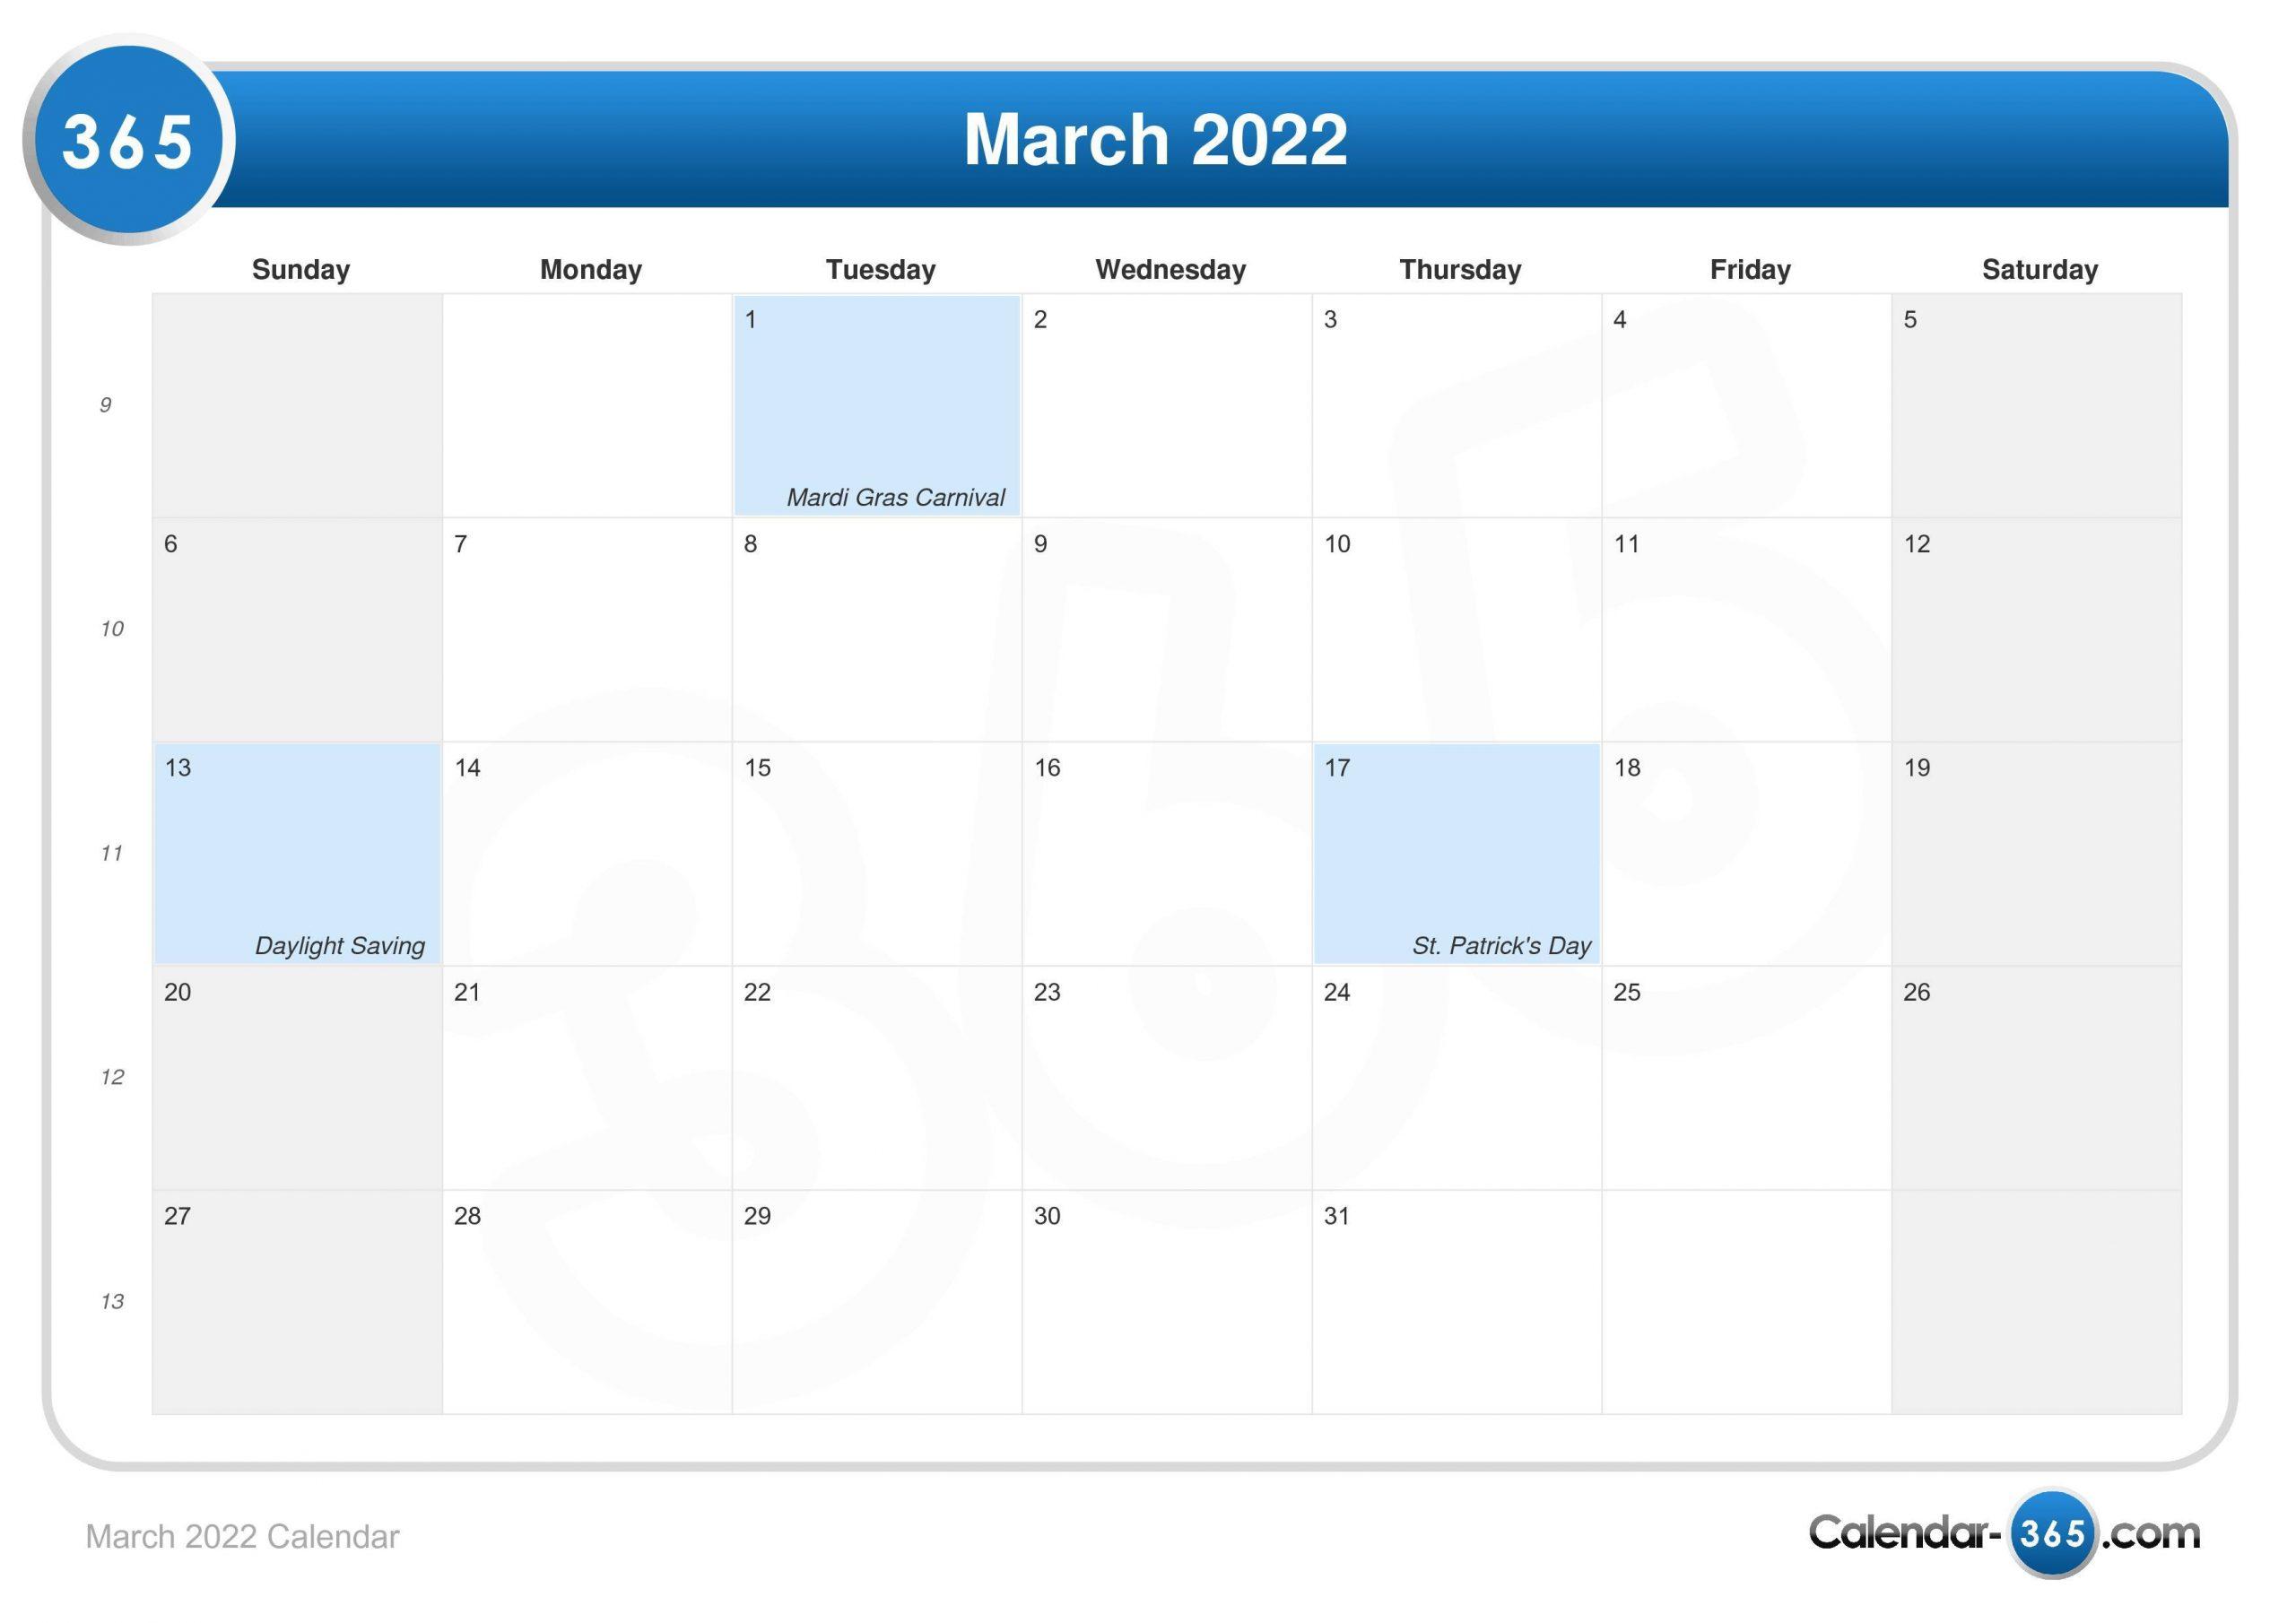 March 2022 Calendar With Regard To Printable Calendars 2022 March